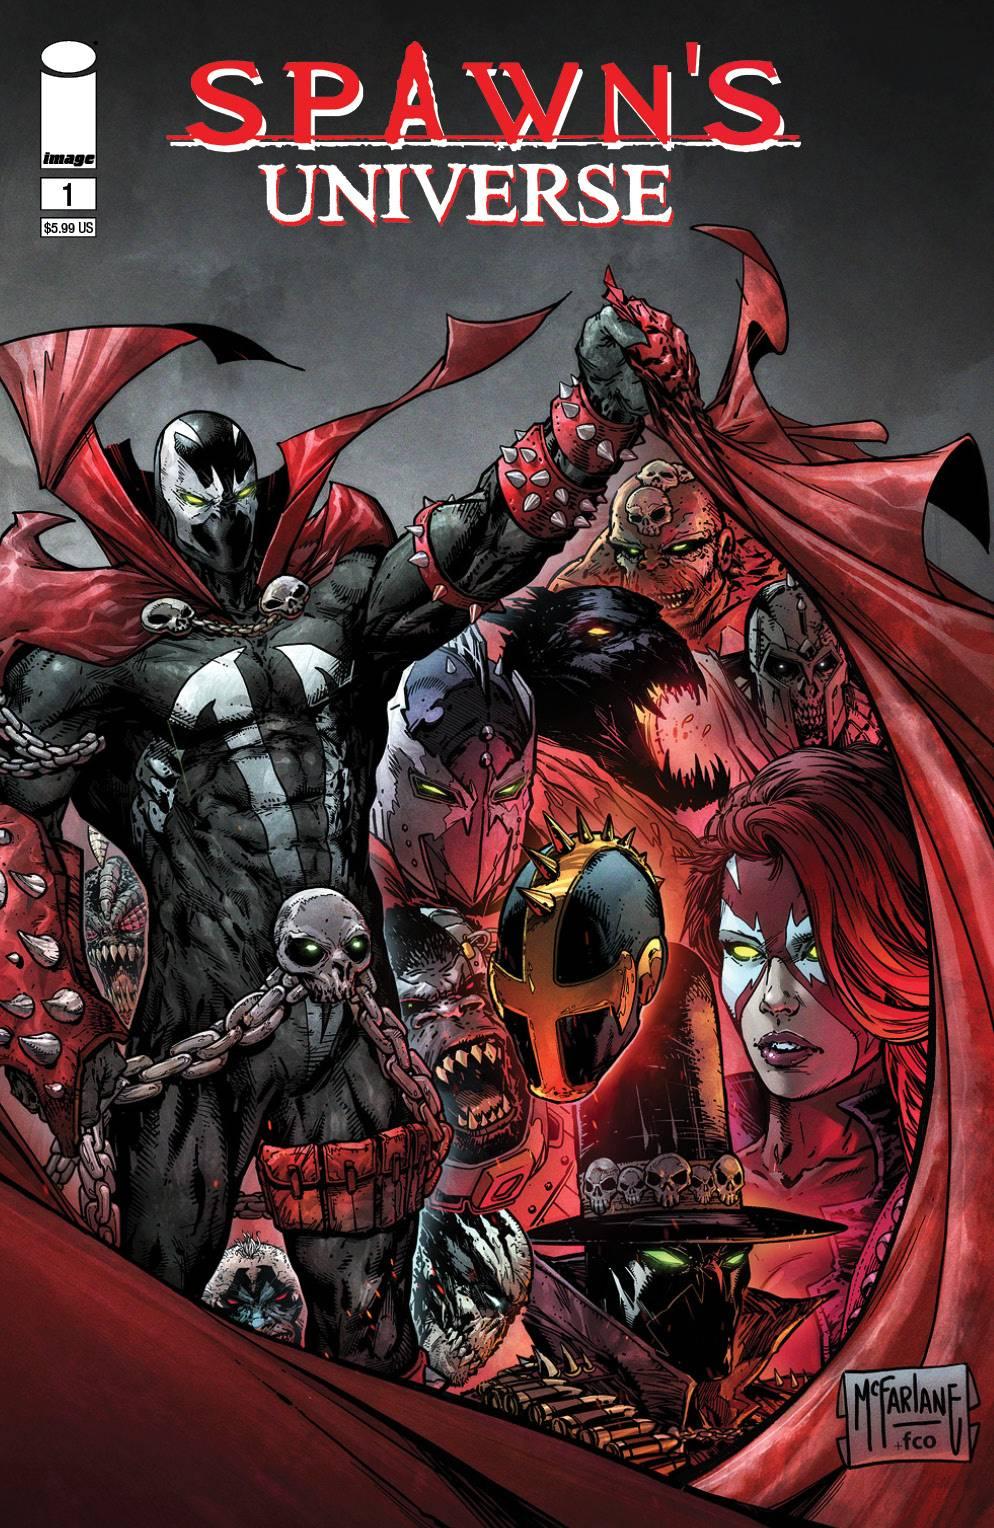 STL193141 ComicList: Image Comics New Releases for 06/23/2021